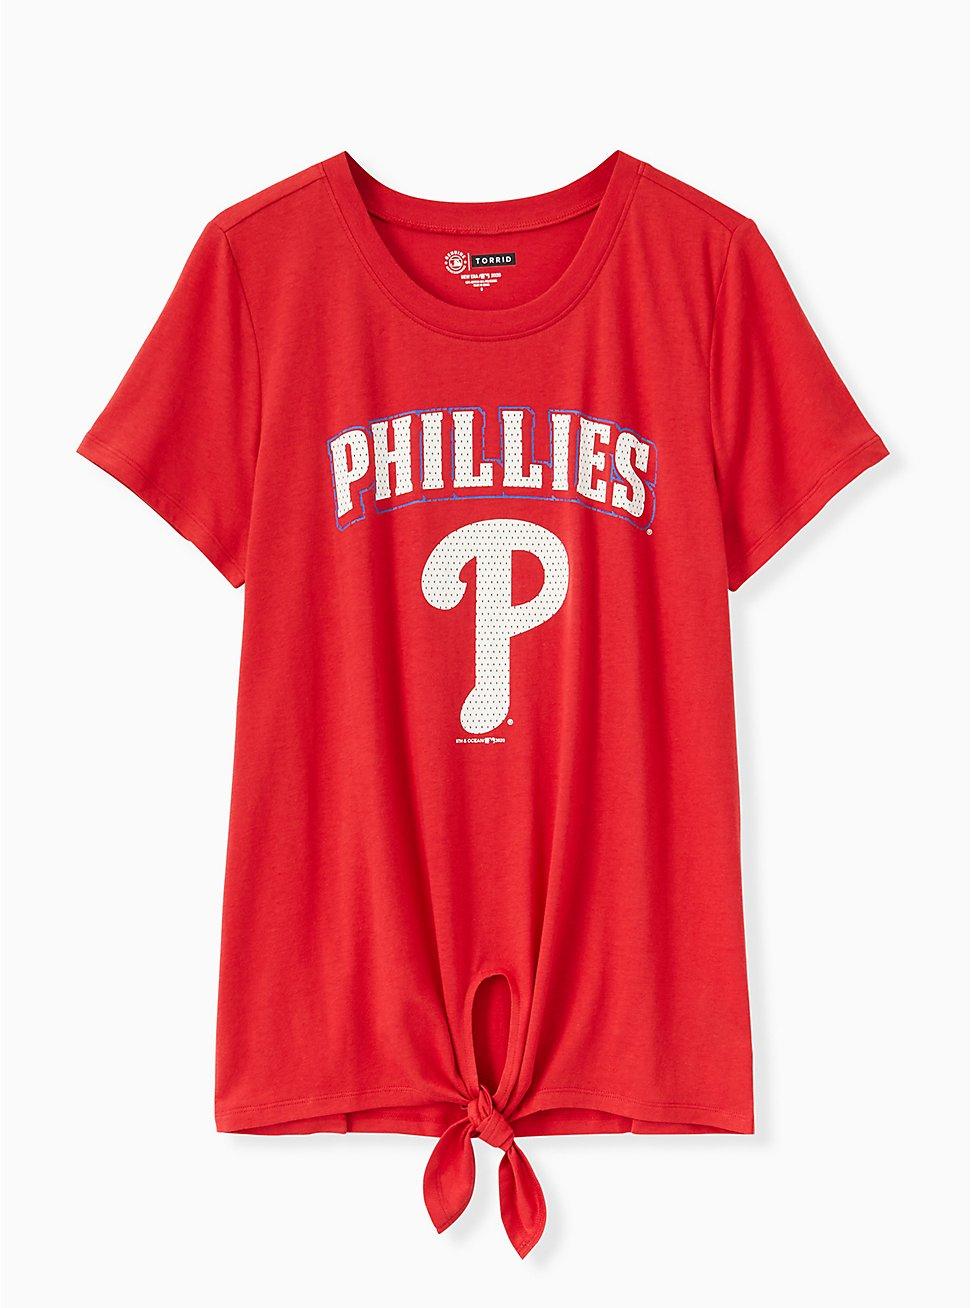 MLB Philadelphia Phillies Tie Front Tee - Red, JESTER RED, hi-res